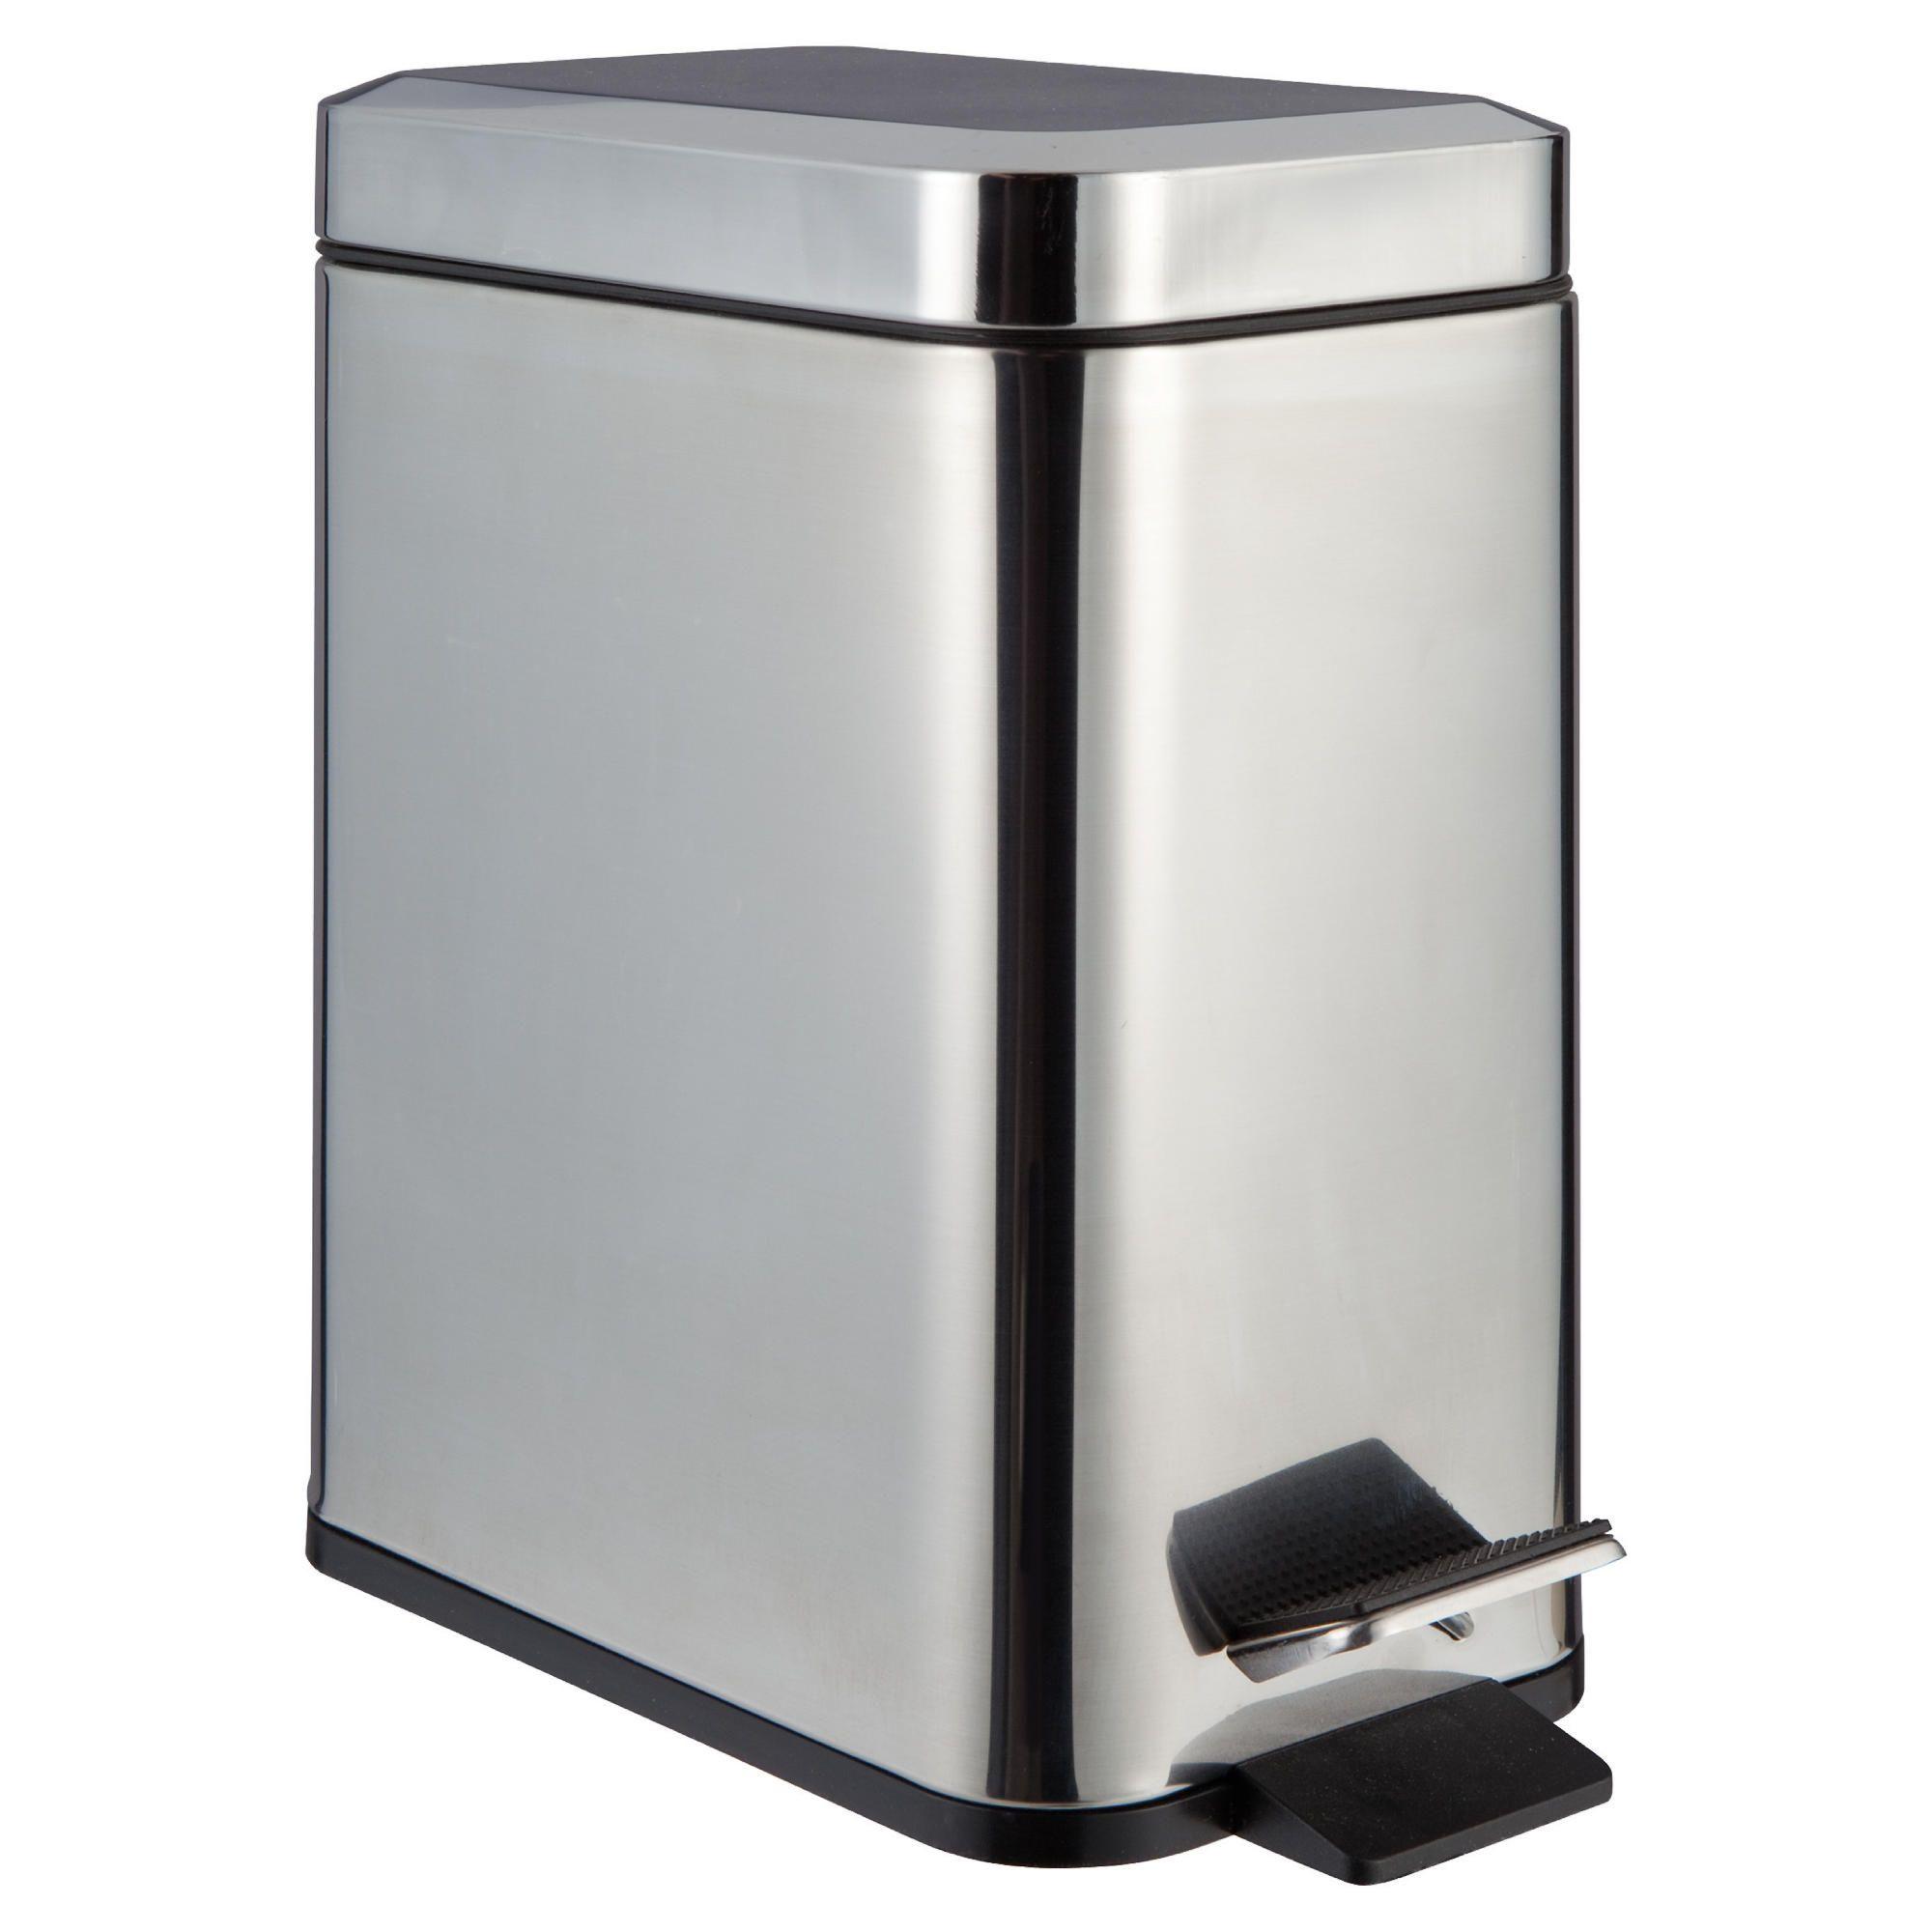 Myshop - Slimline waste bin ...